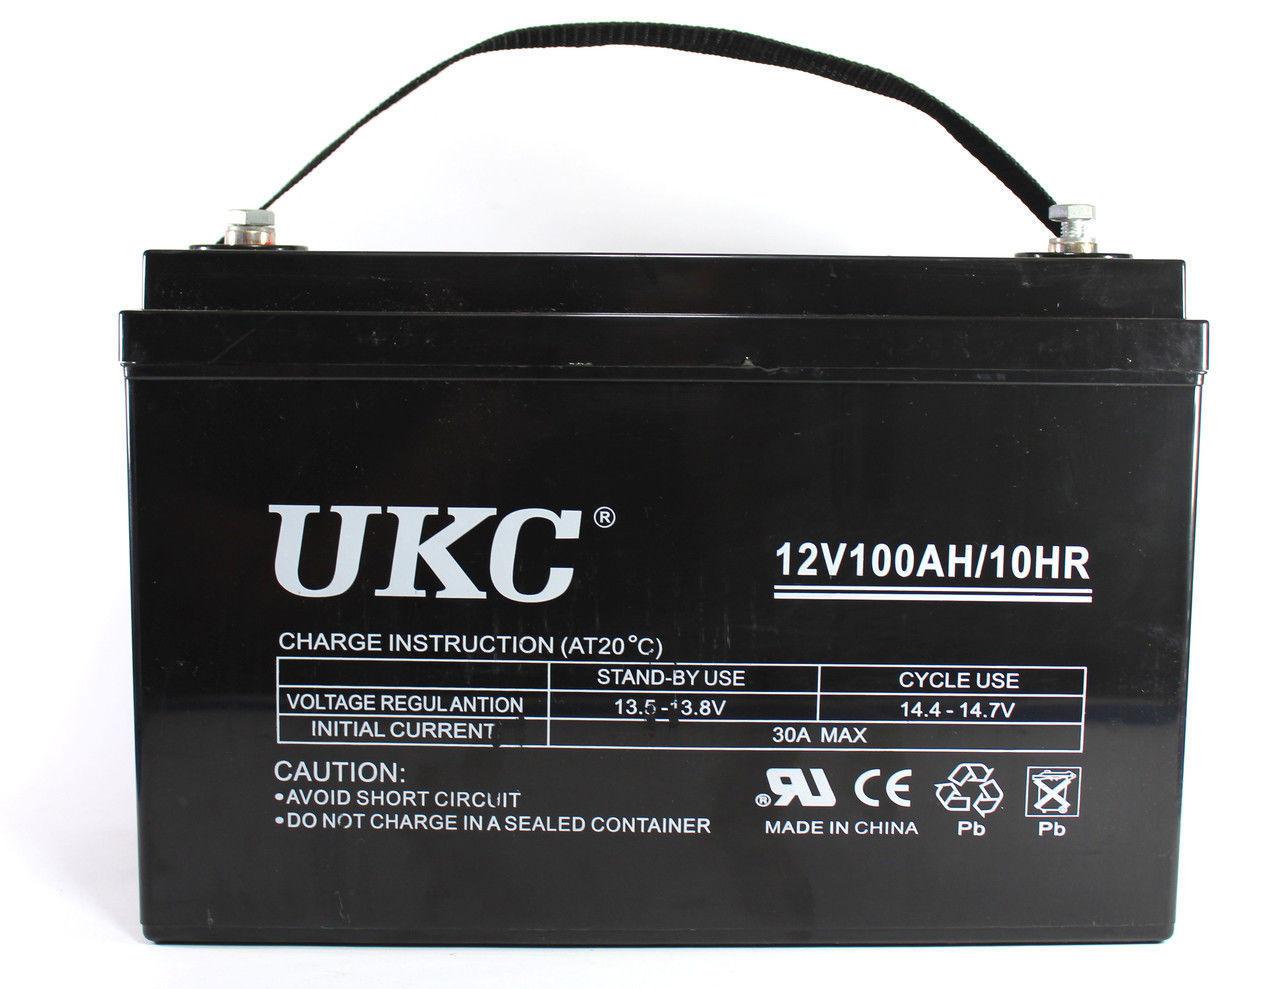 "Аккумулятор BATTERY GEL 12V 100A UKC, гелевый кислотно-свинцовый аккумулятор, аккумуляторная батарея - Интернет магазин ""24Argo"" в Днепре"